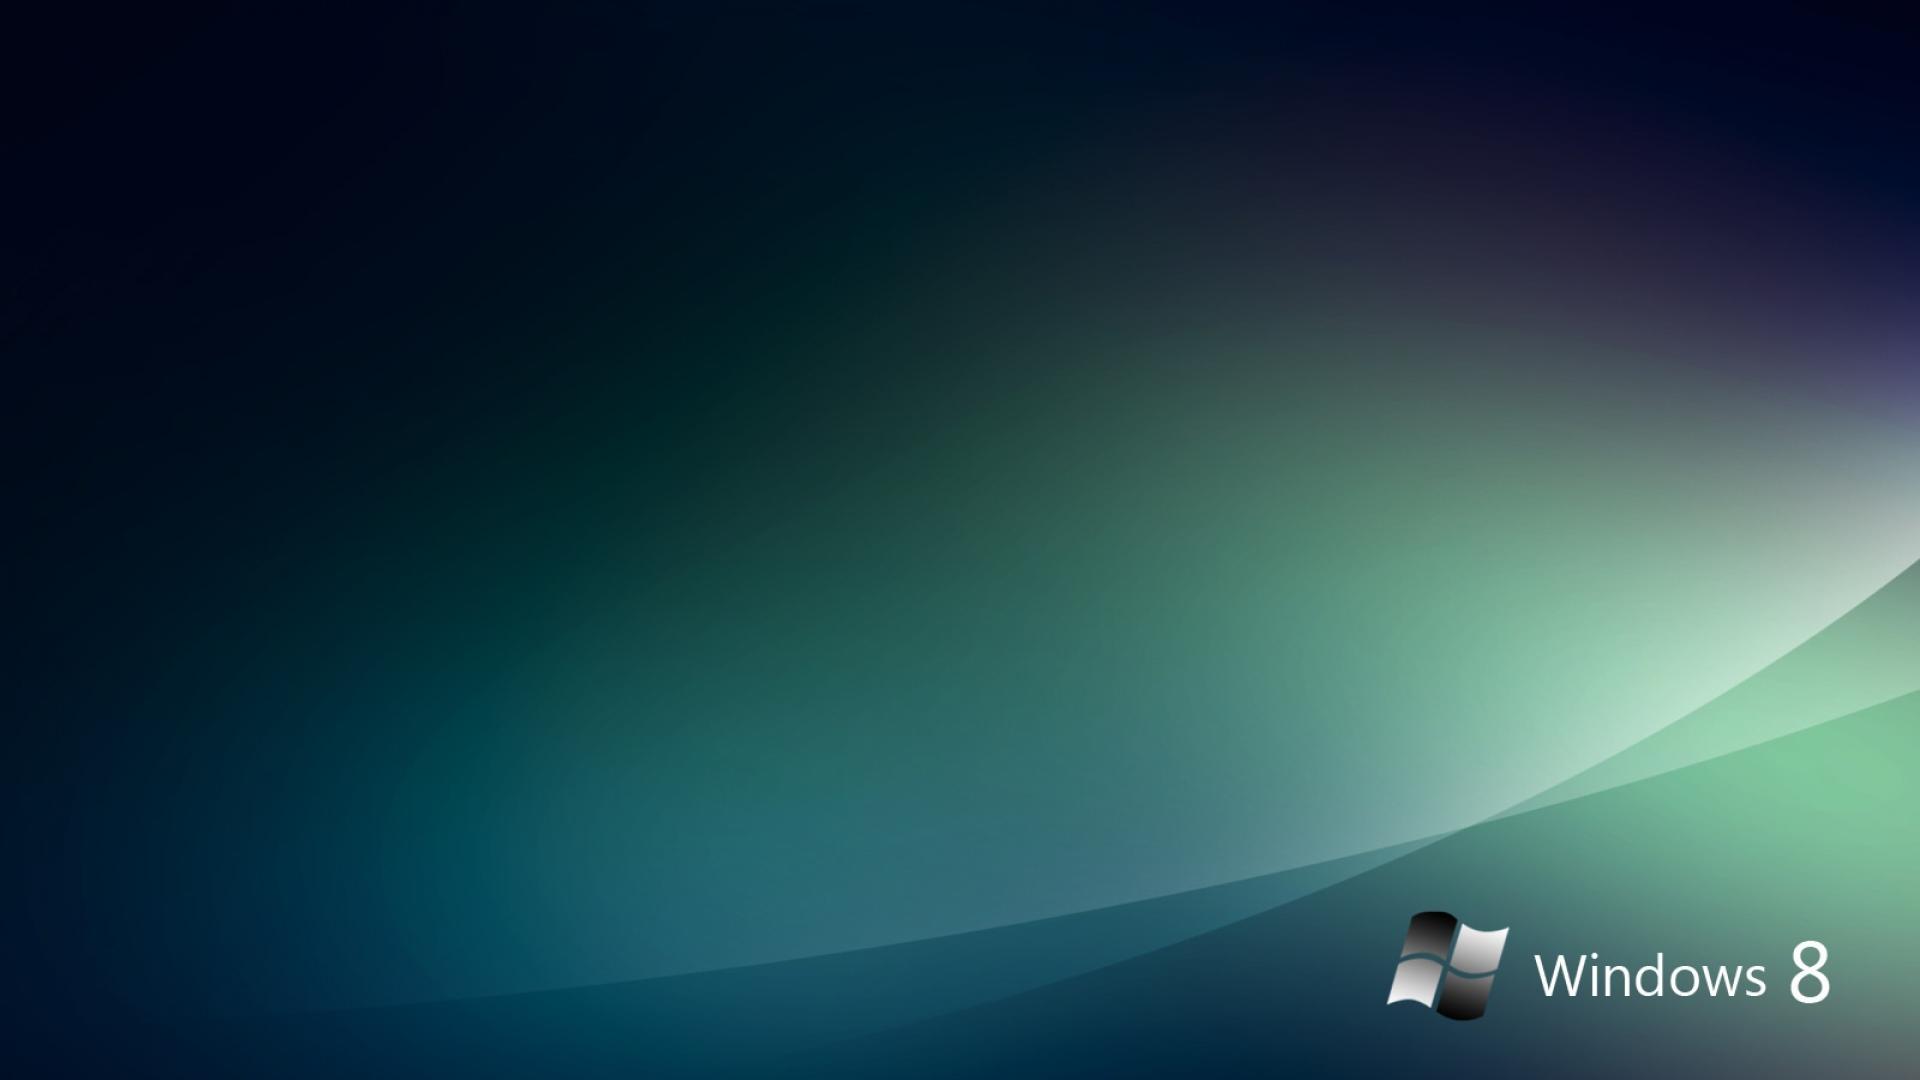 Dark Windows 8 Wallpaper